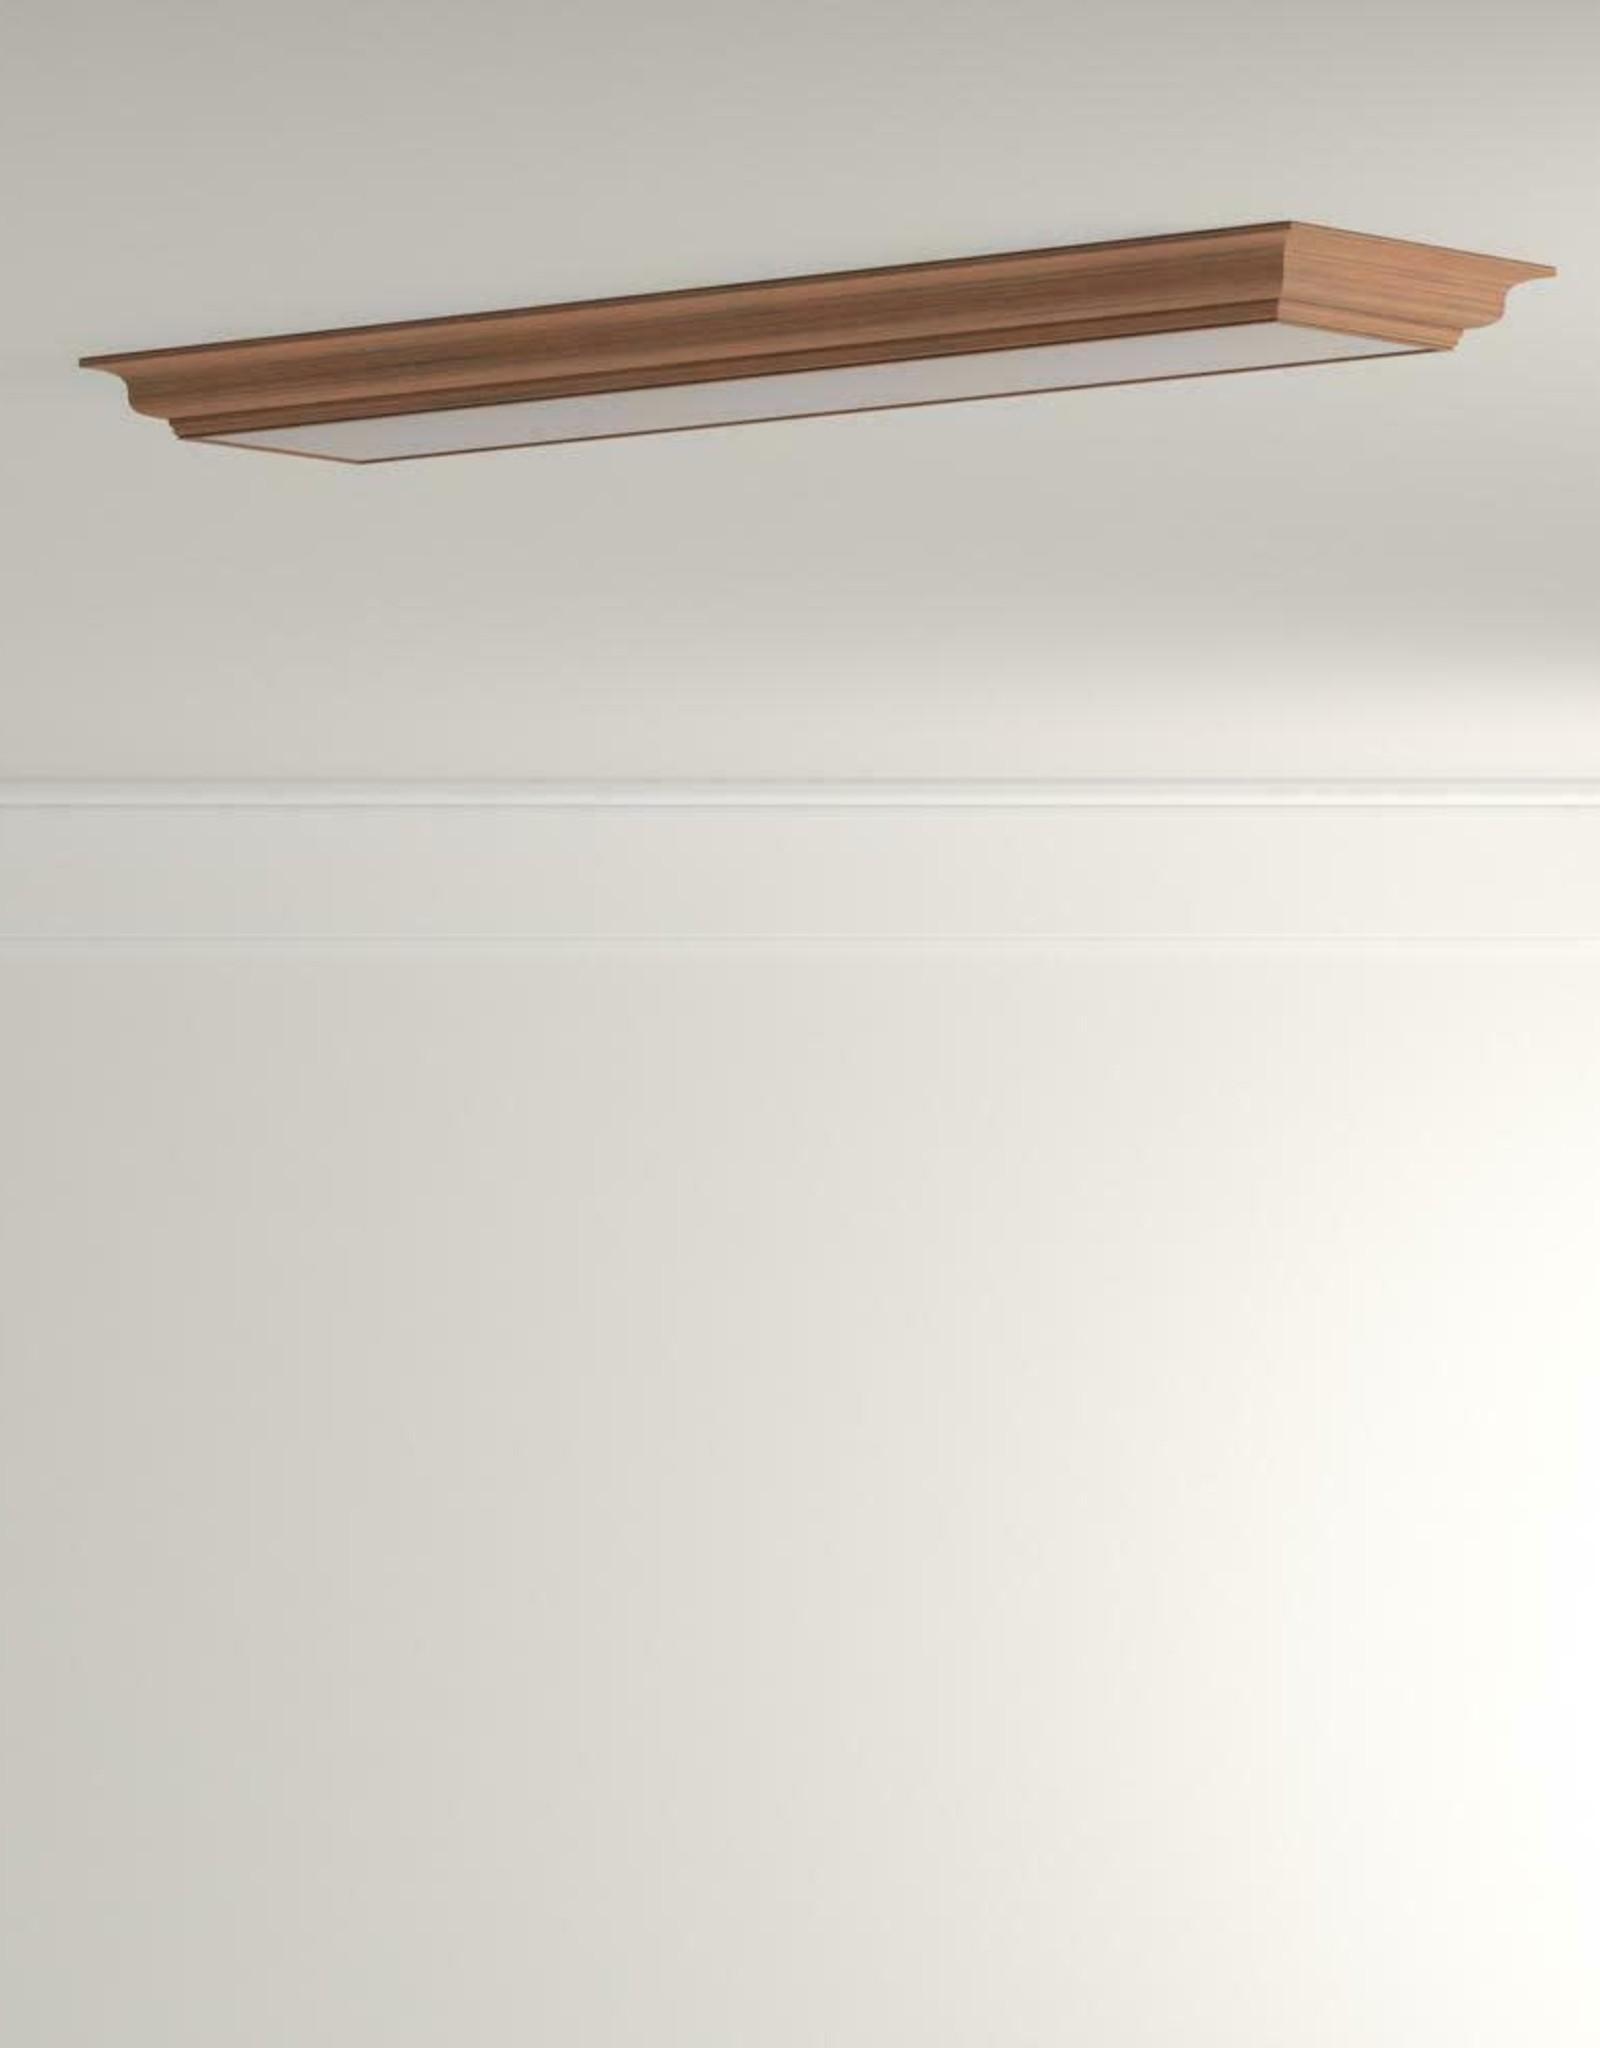 Lithonia Lighting Cambridge 4 ft. Oak LED Flush Mount